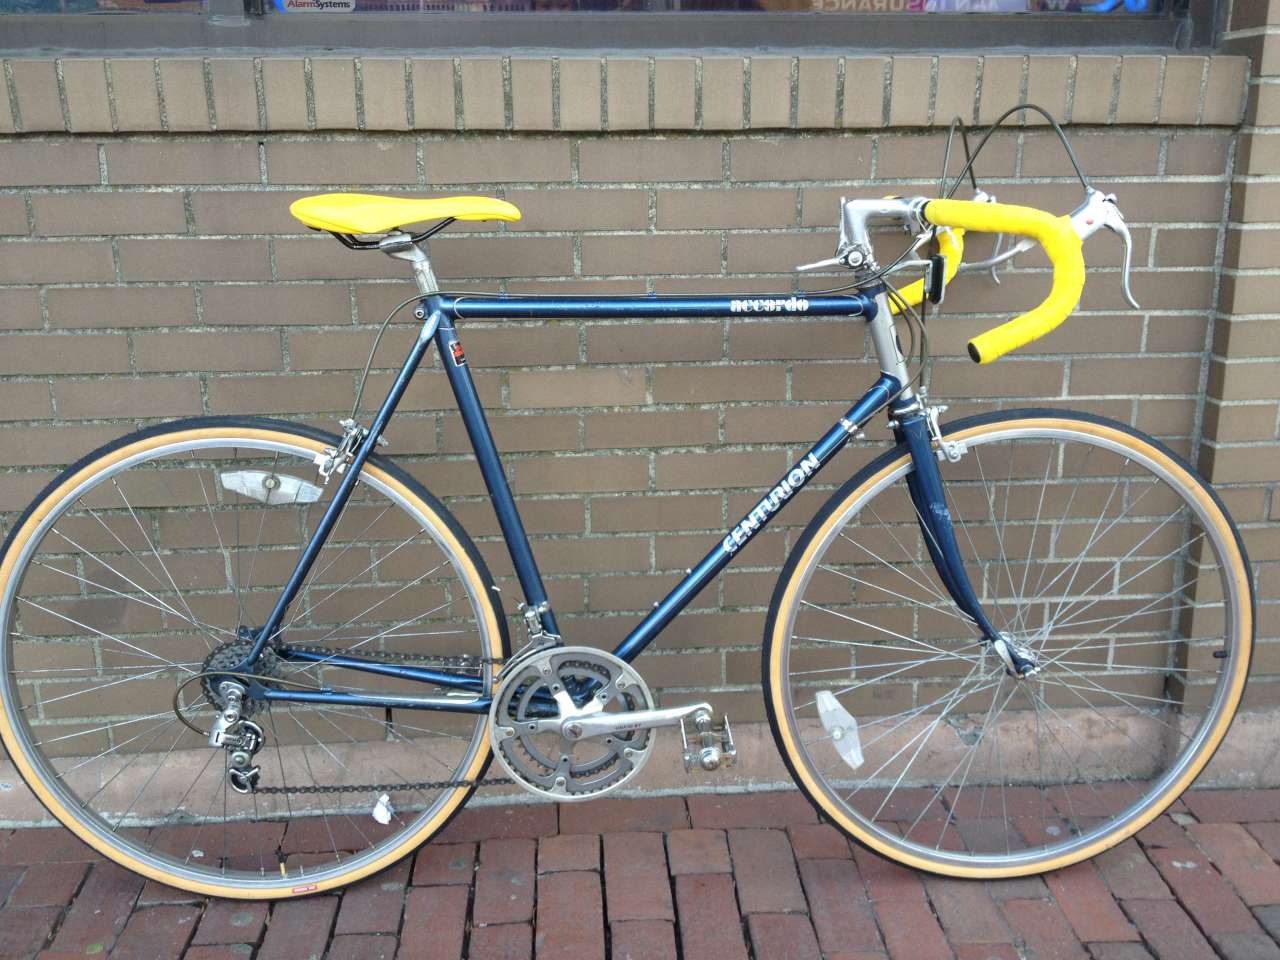 bike boom refurbished bikes 1984 centurion accordo road bike. Black Bedroom Furniture Sets. Home Design Ideas